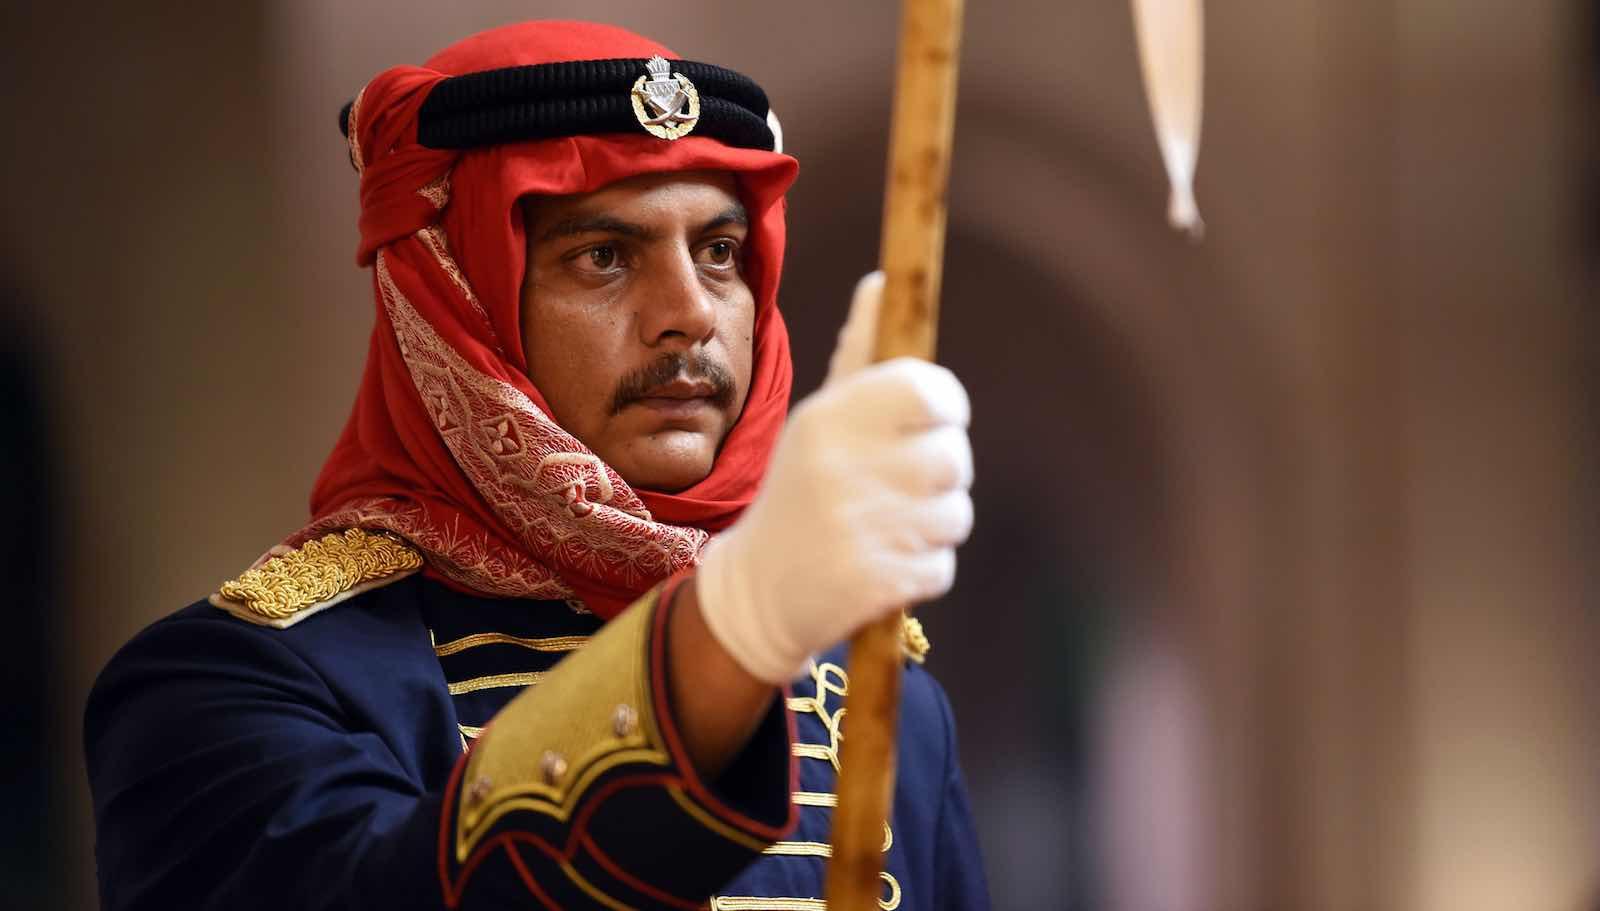 Bahraini ceremonial guards during the visit of US Secretary of Defense James Mattis (Photo: James N. Mattis/Flickr)